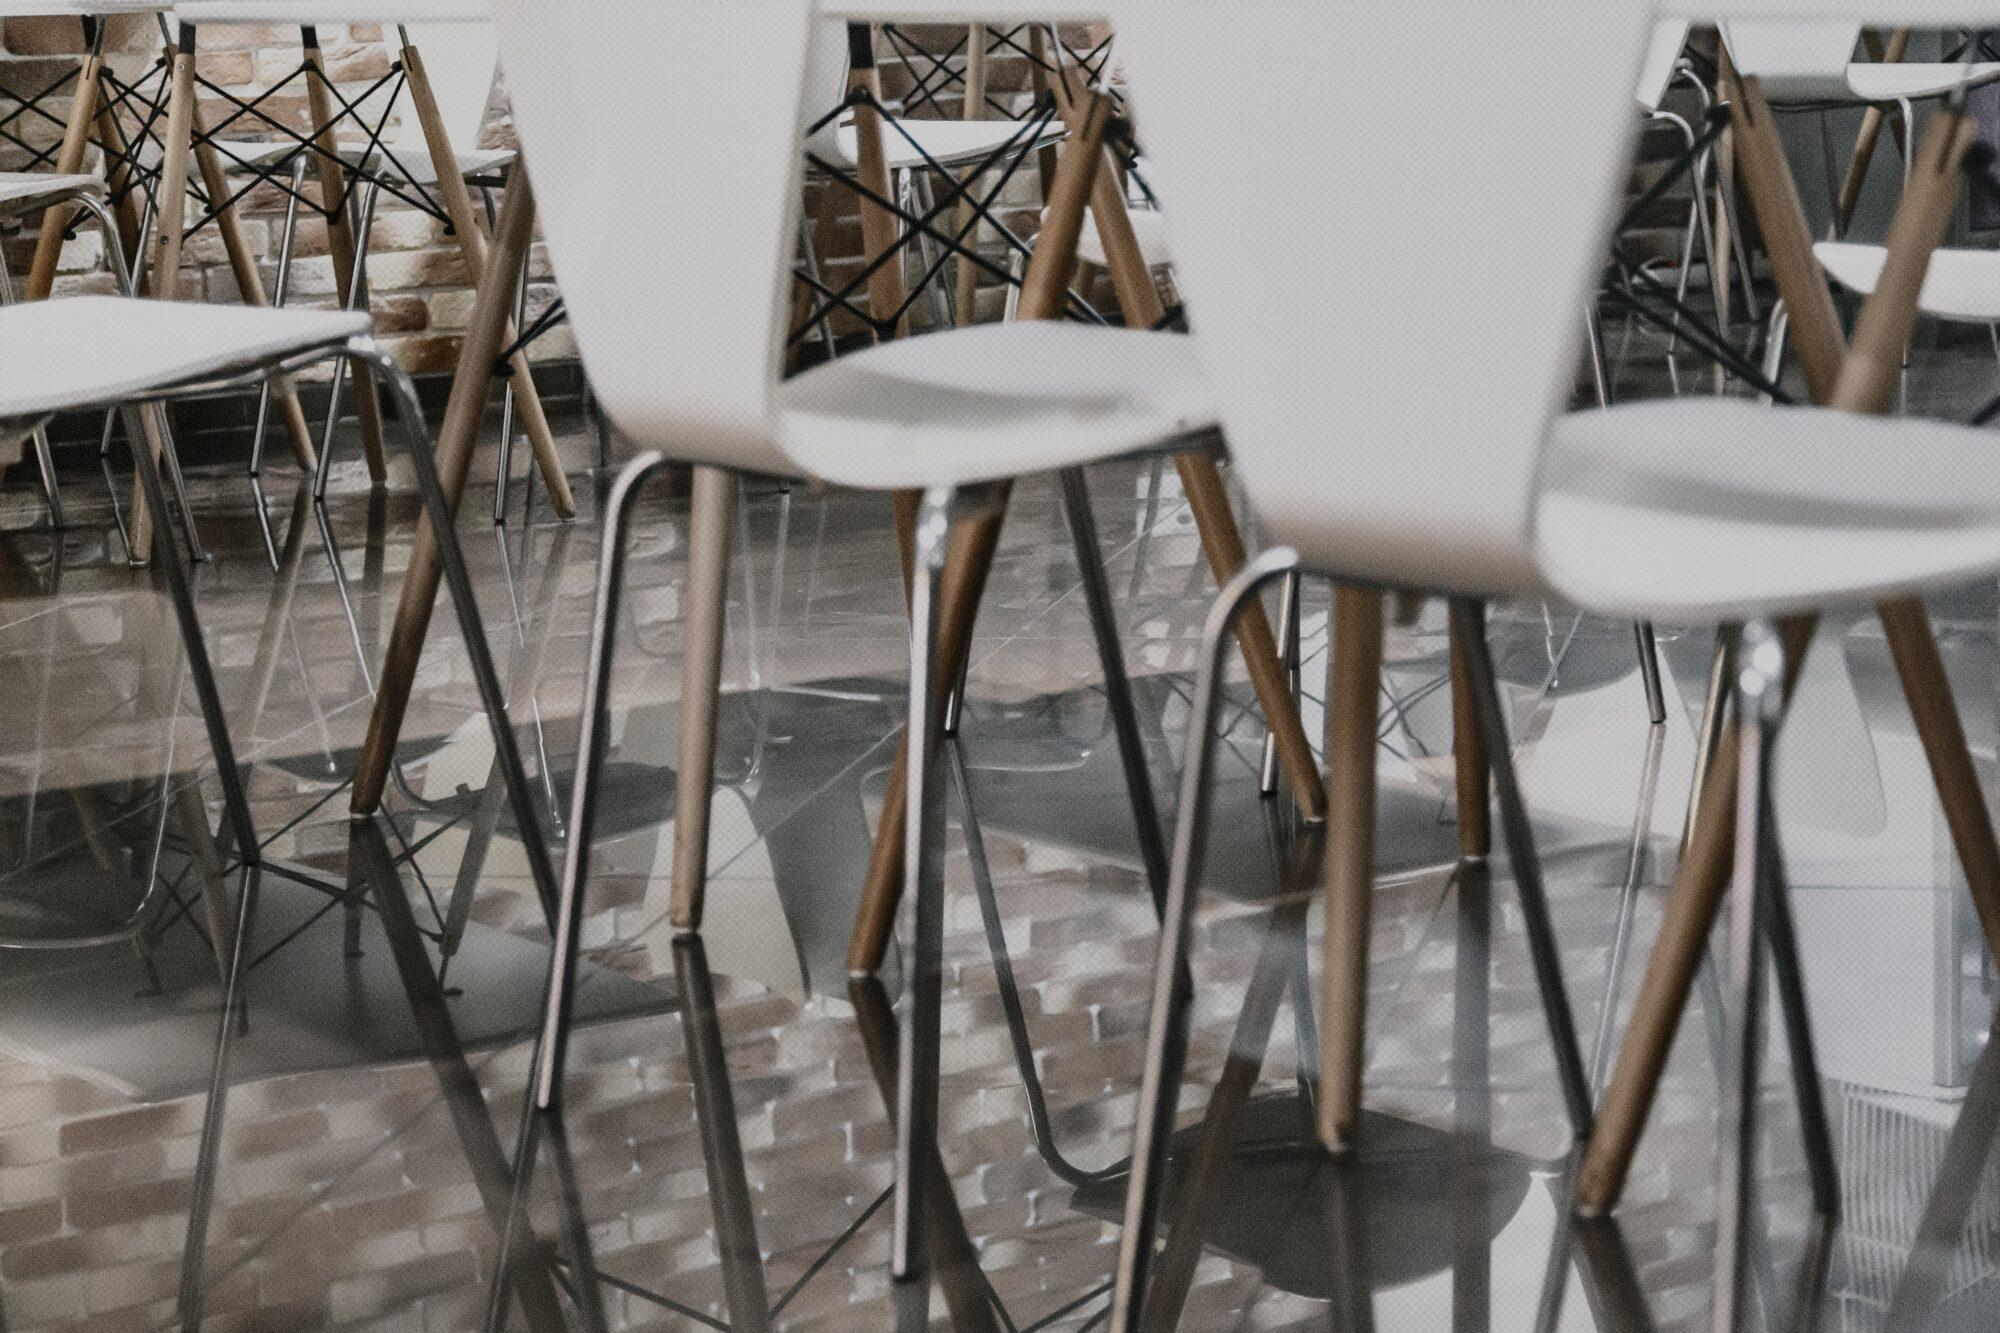 7 stol – dansk design til hjemmet